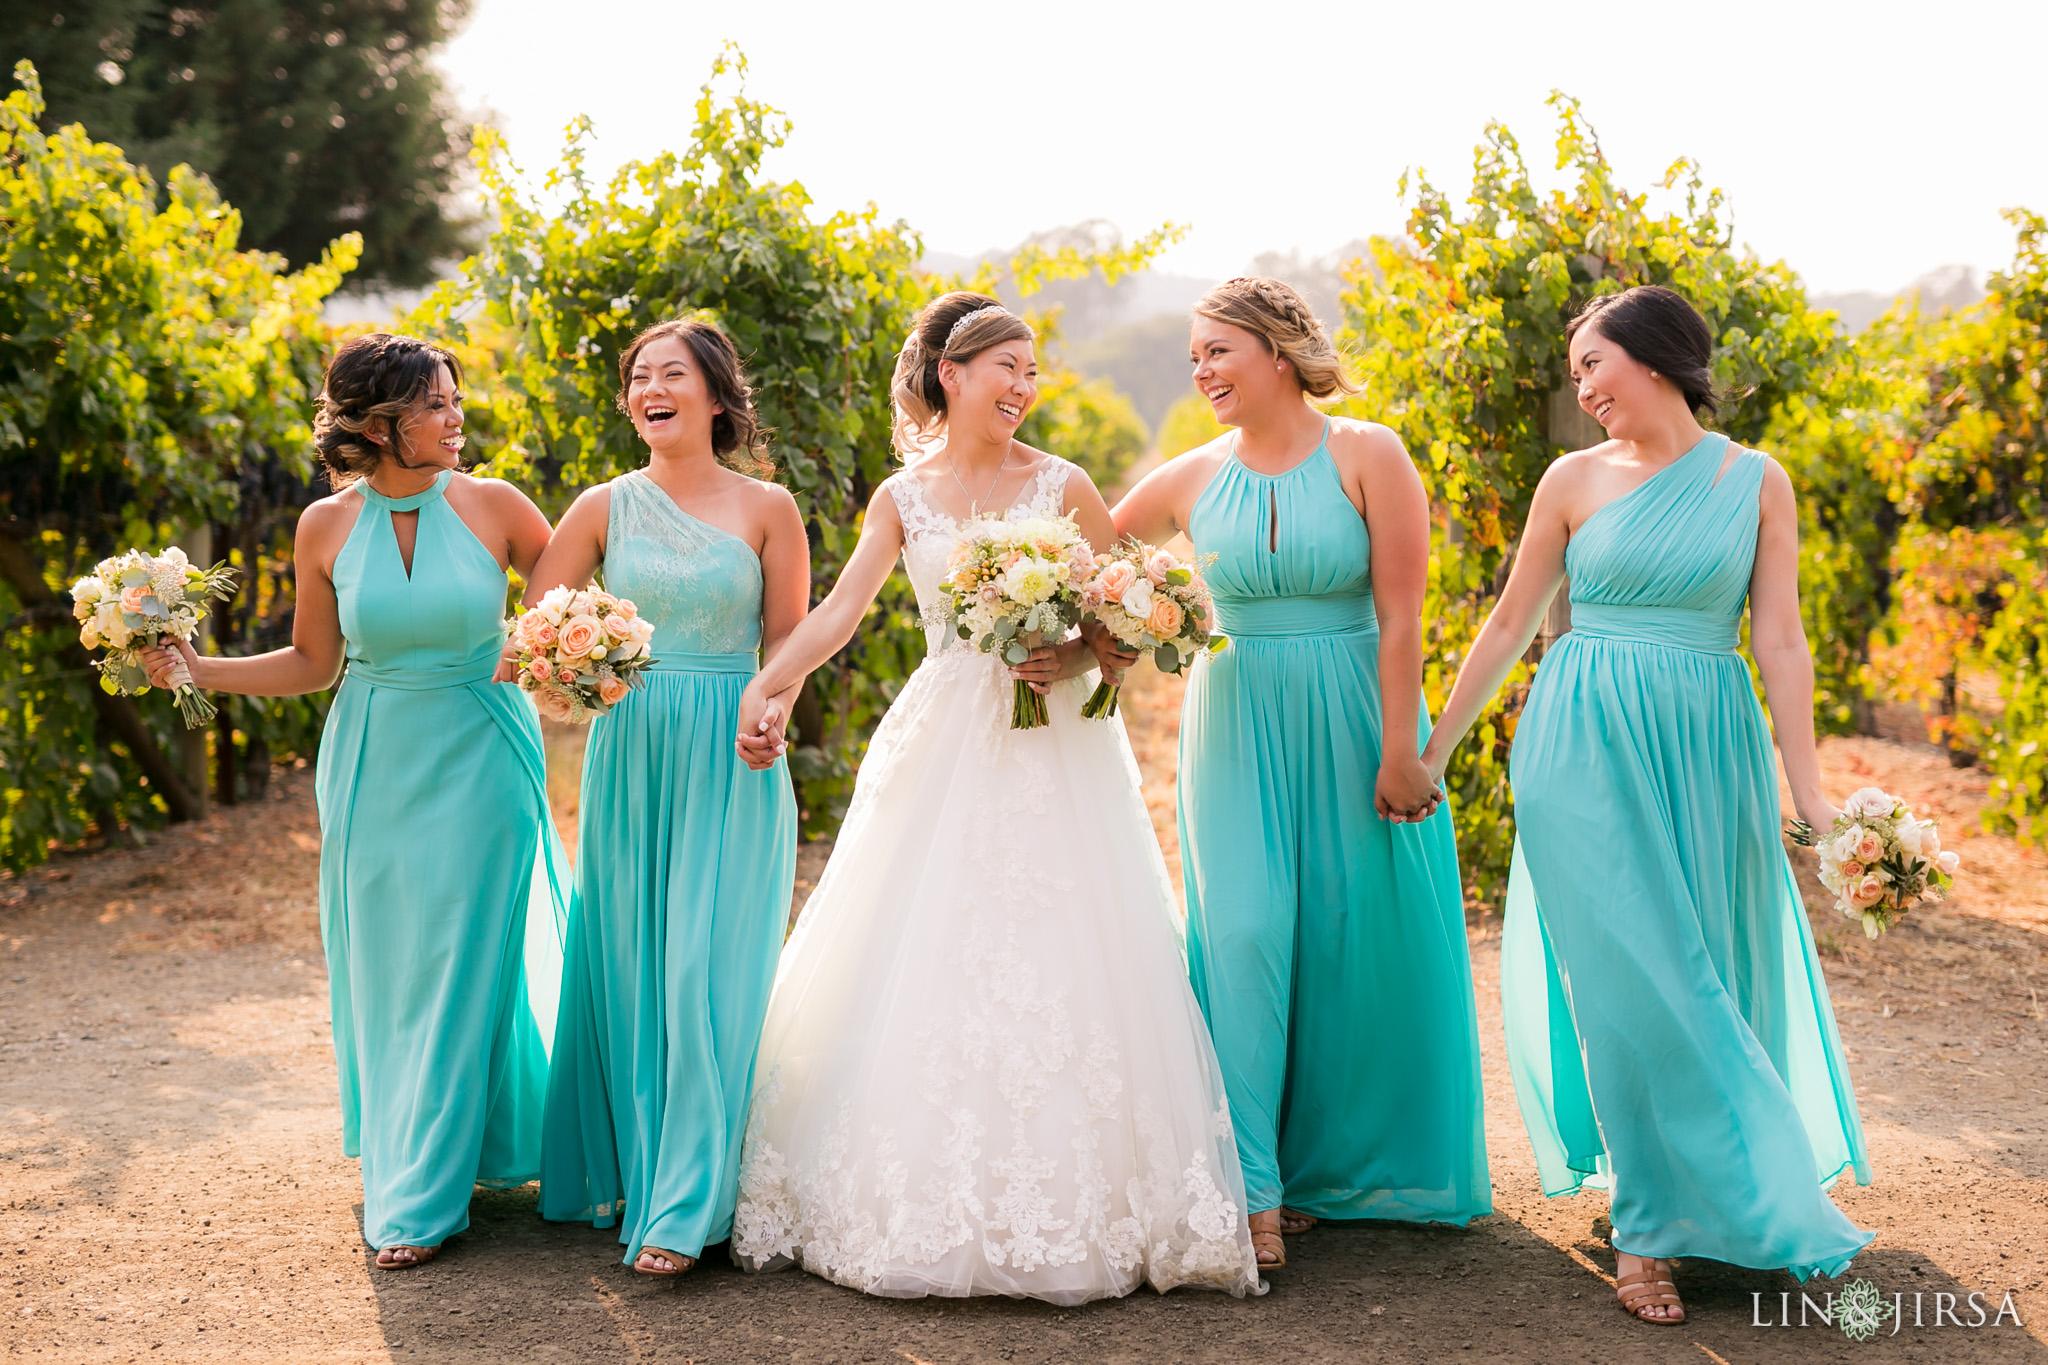 Outdoor wedding at Trentadue Winery